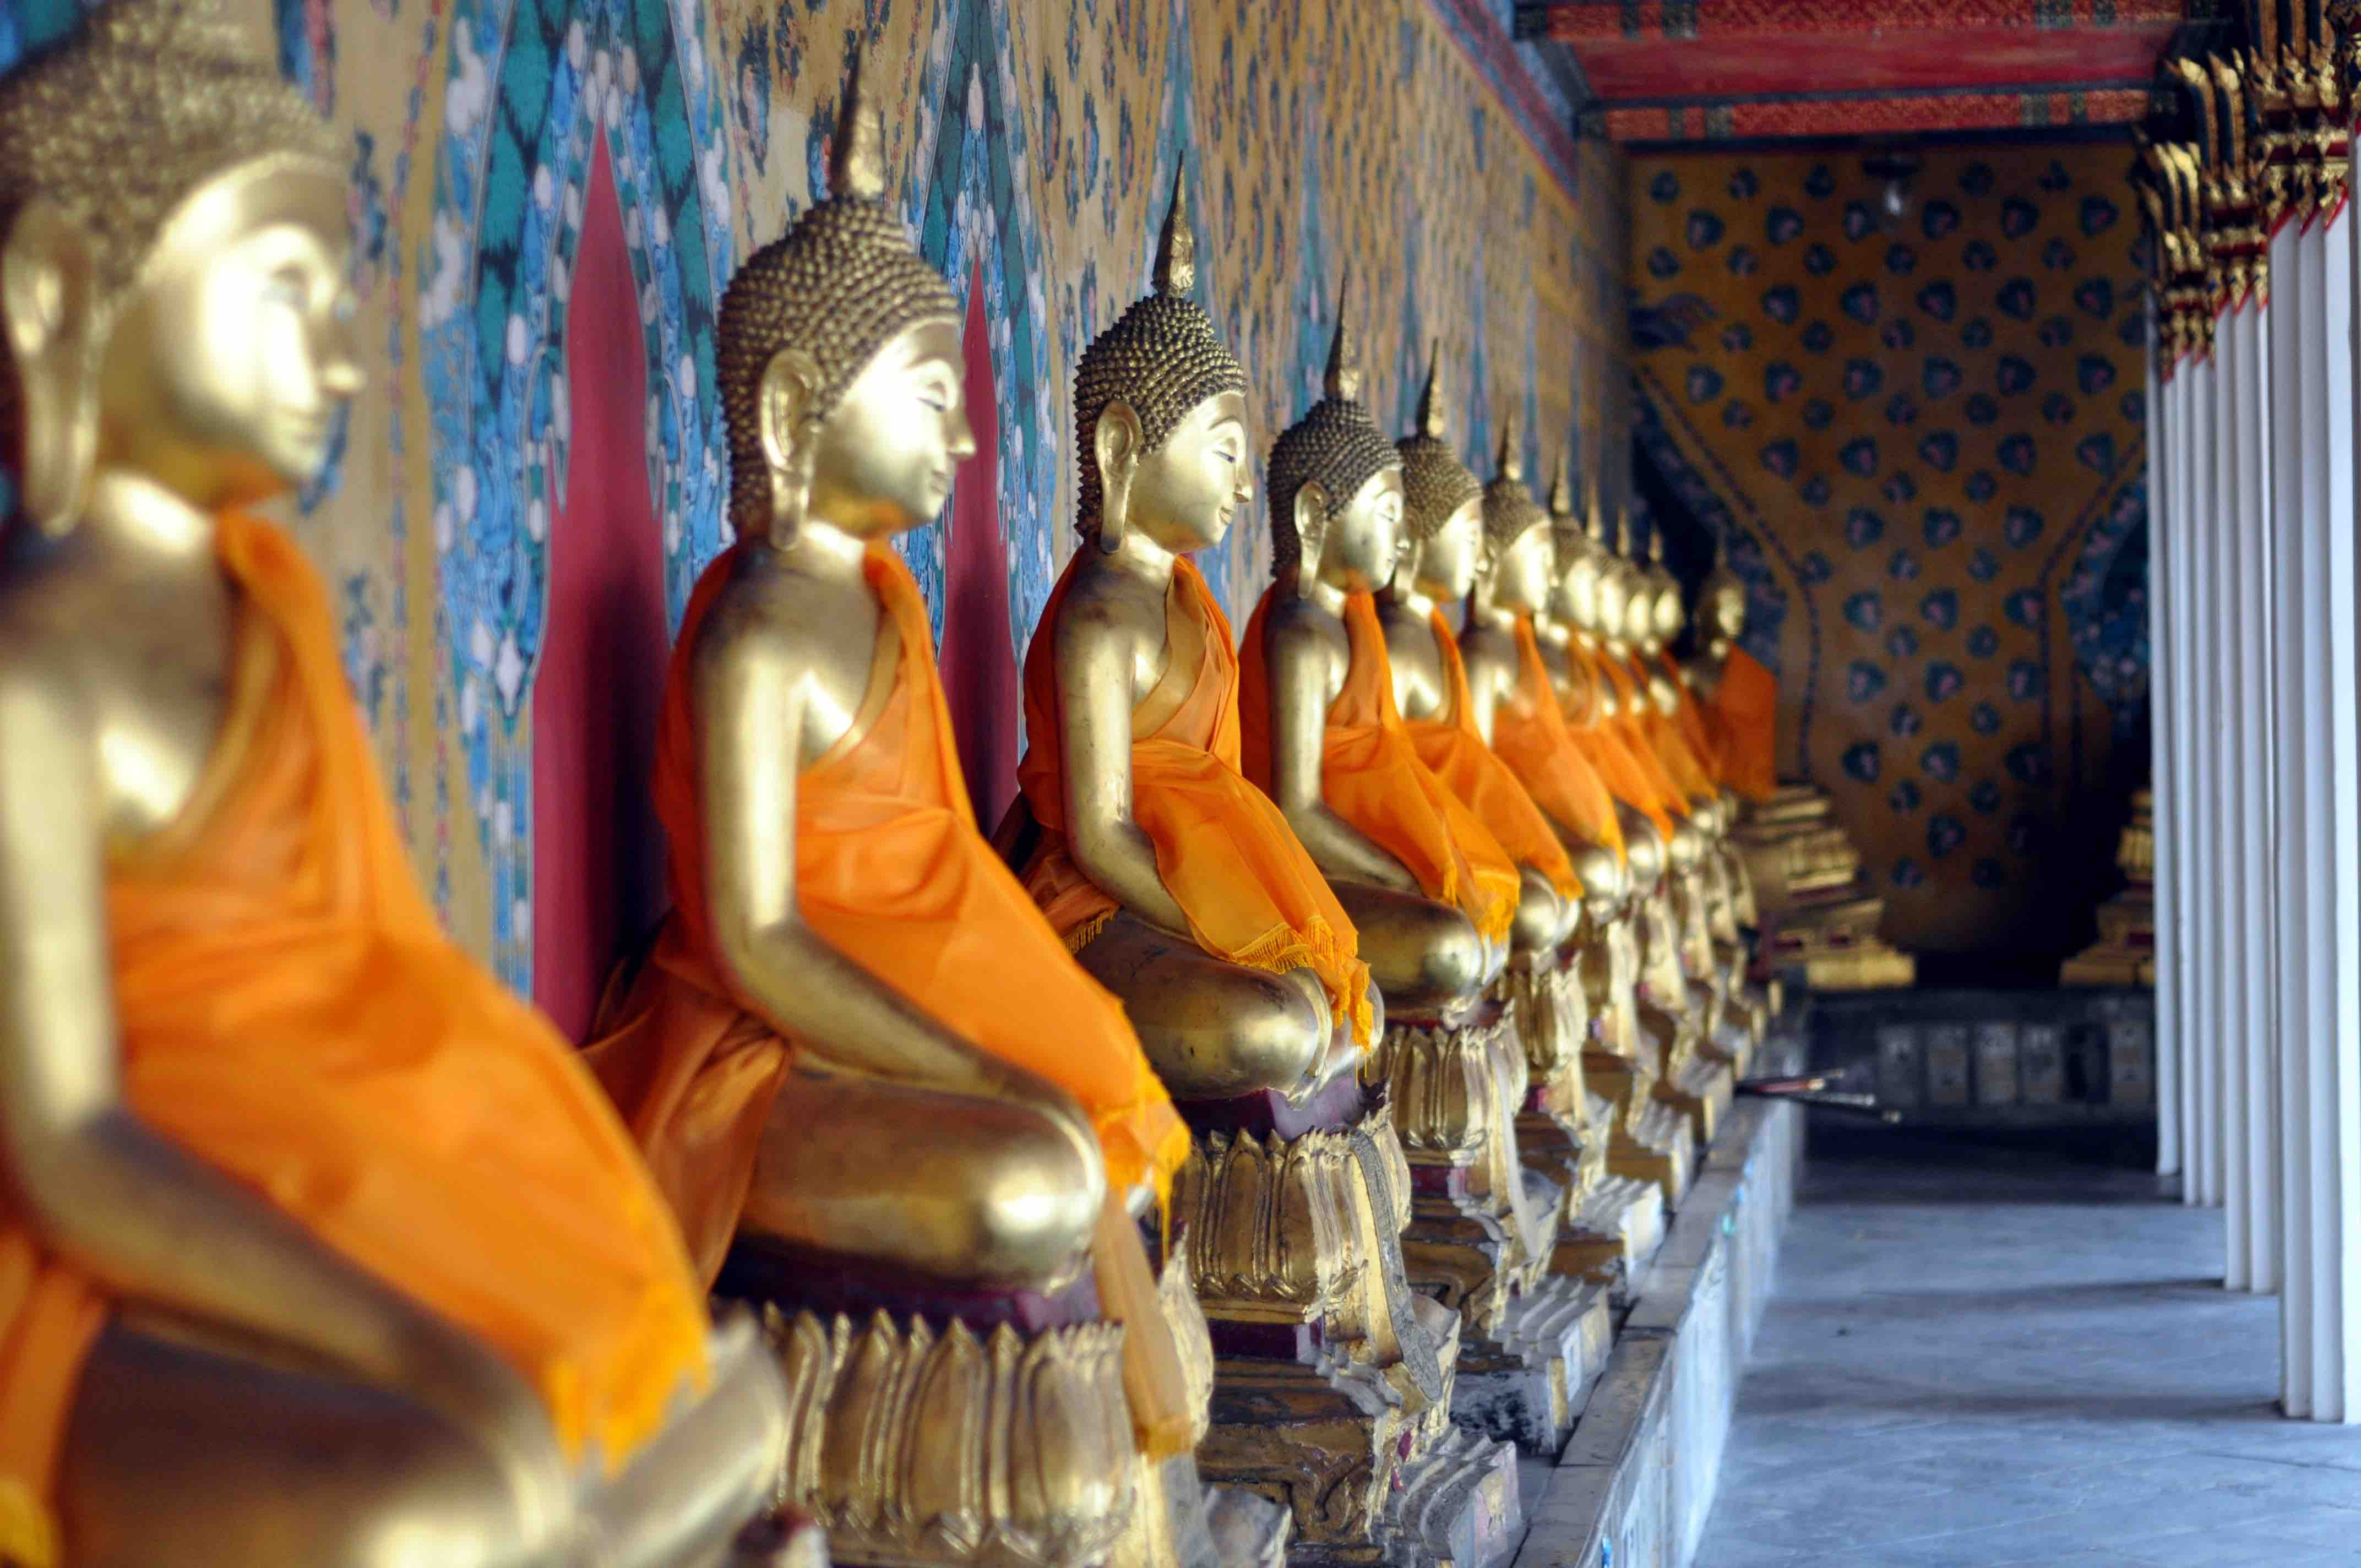 04 - Wat_Arun_ Exterior details